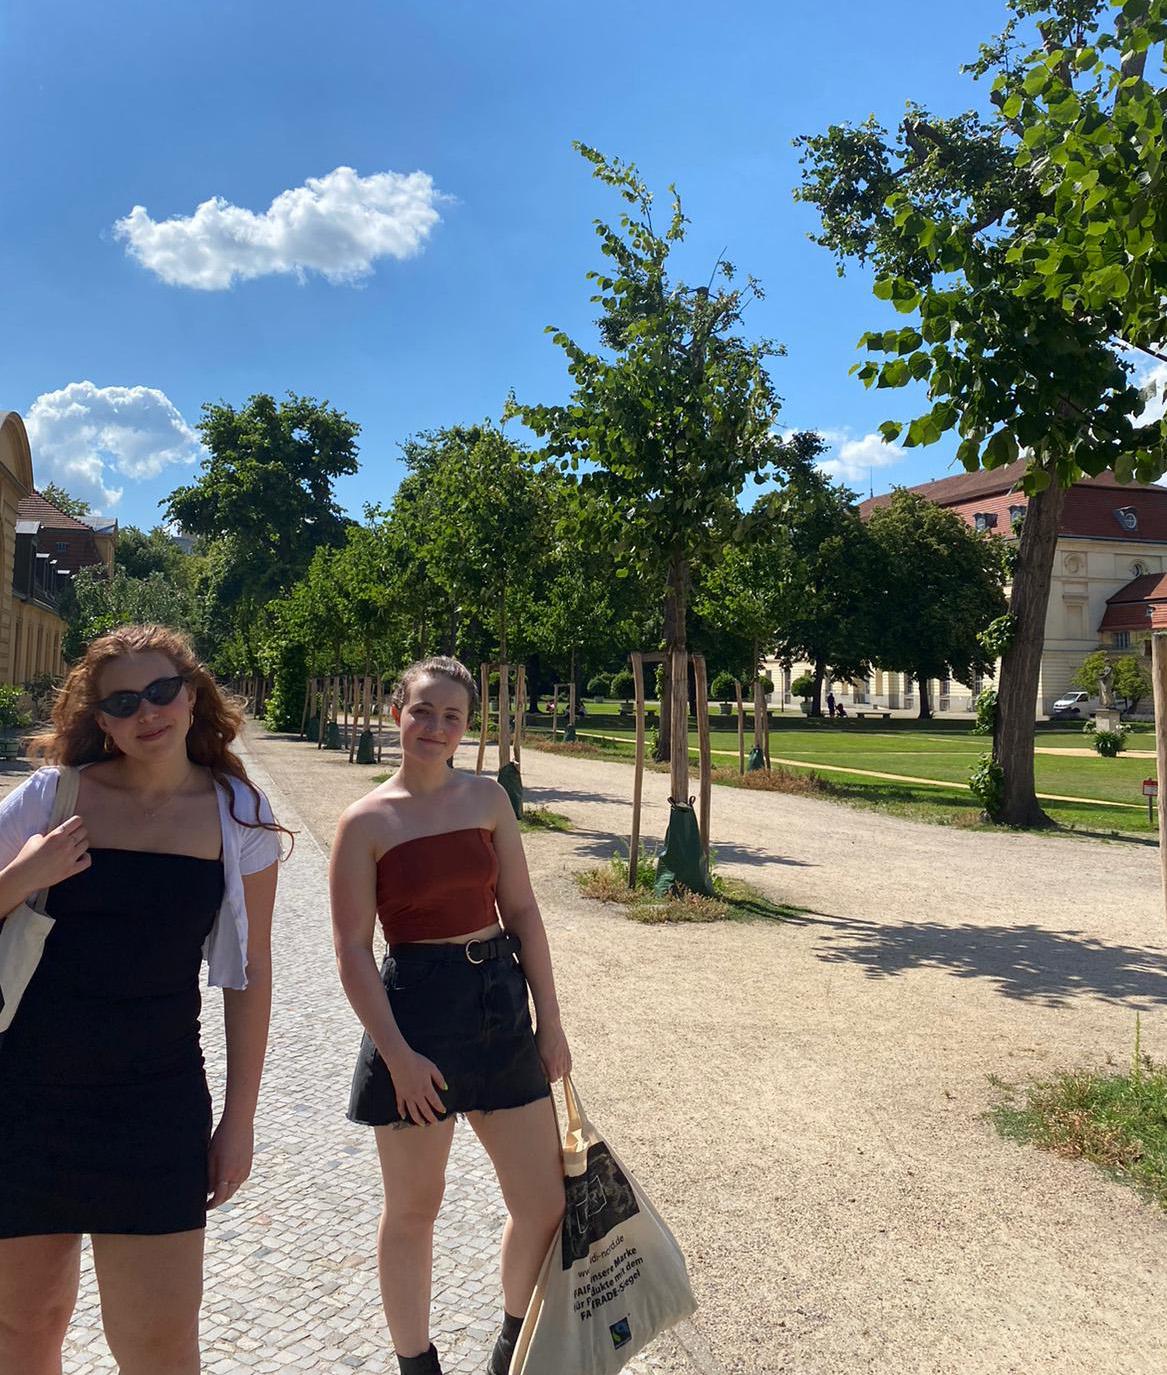 Lauren and a friend walking down the steet